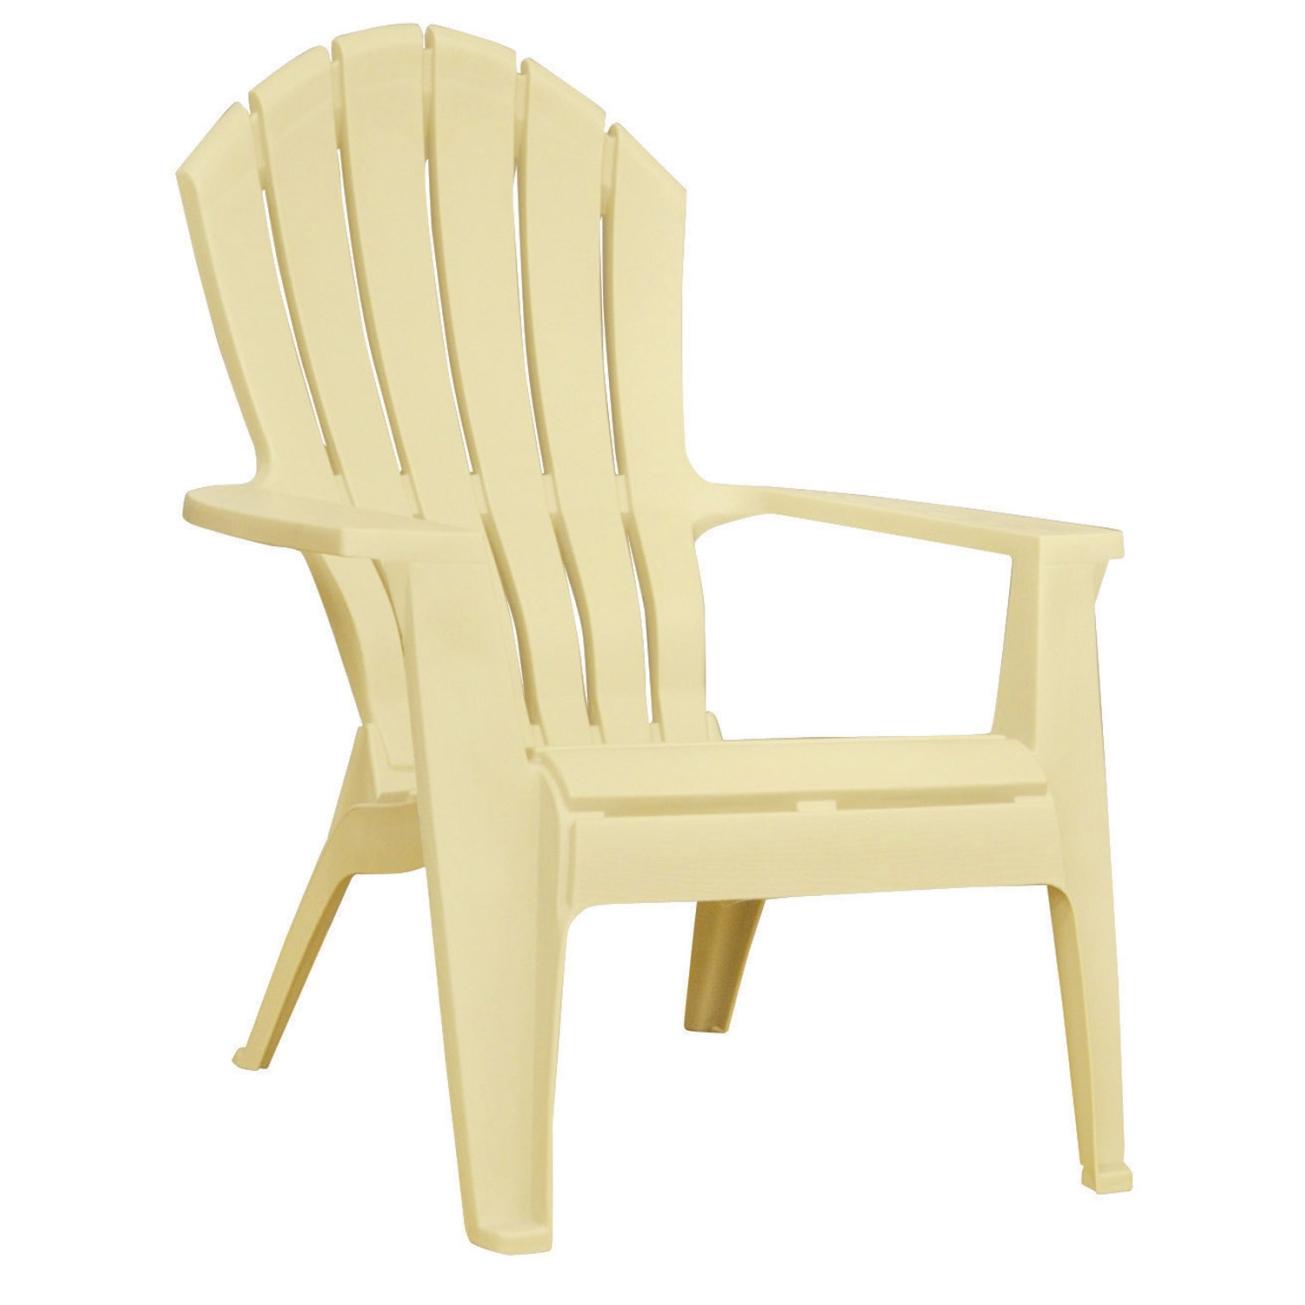 plastic adirondack chairs adams adirondack stacking chair in banana - ace hardware UKLNFBO